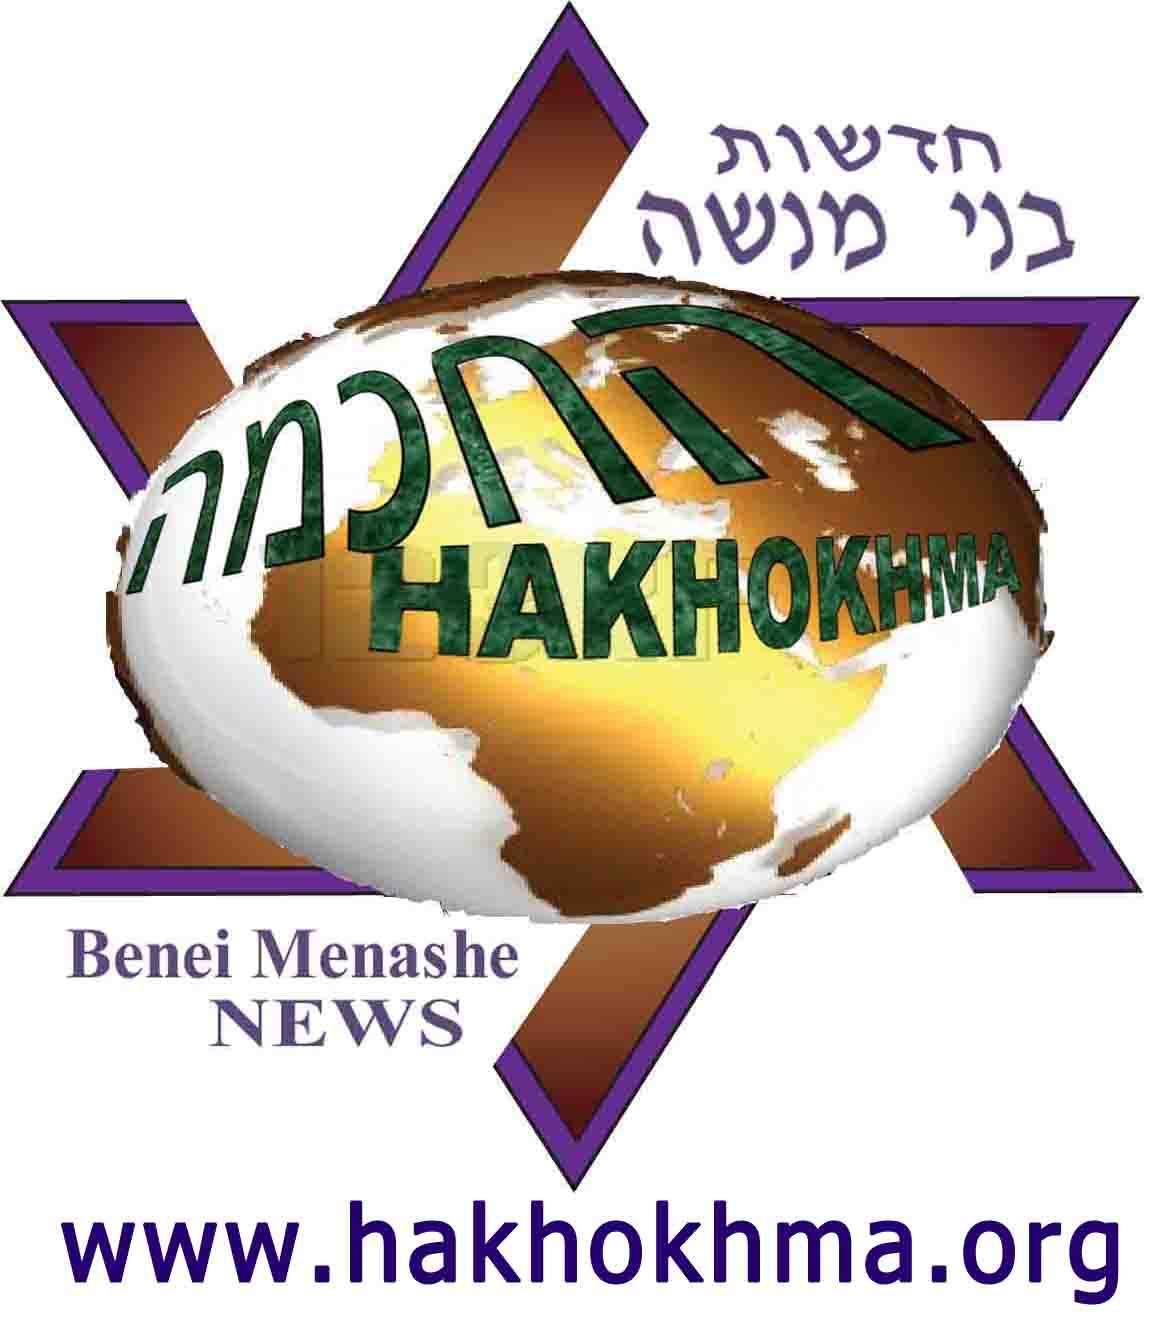 HAKHOKHMA Sign